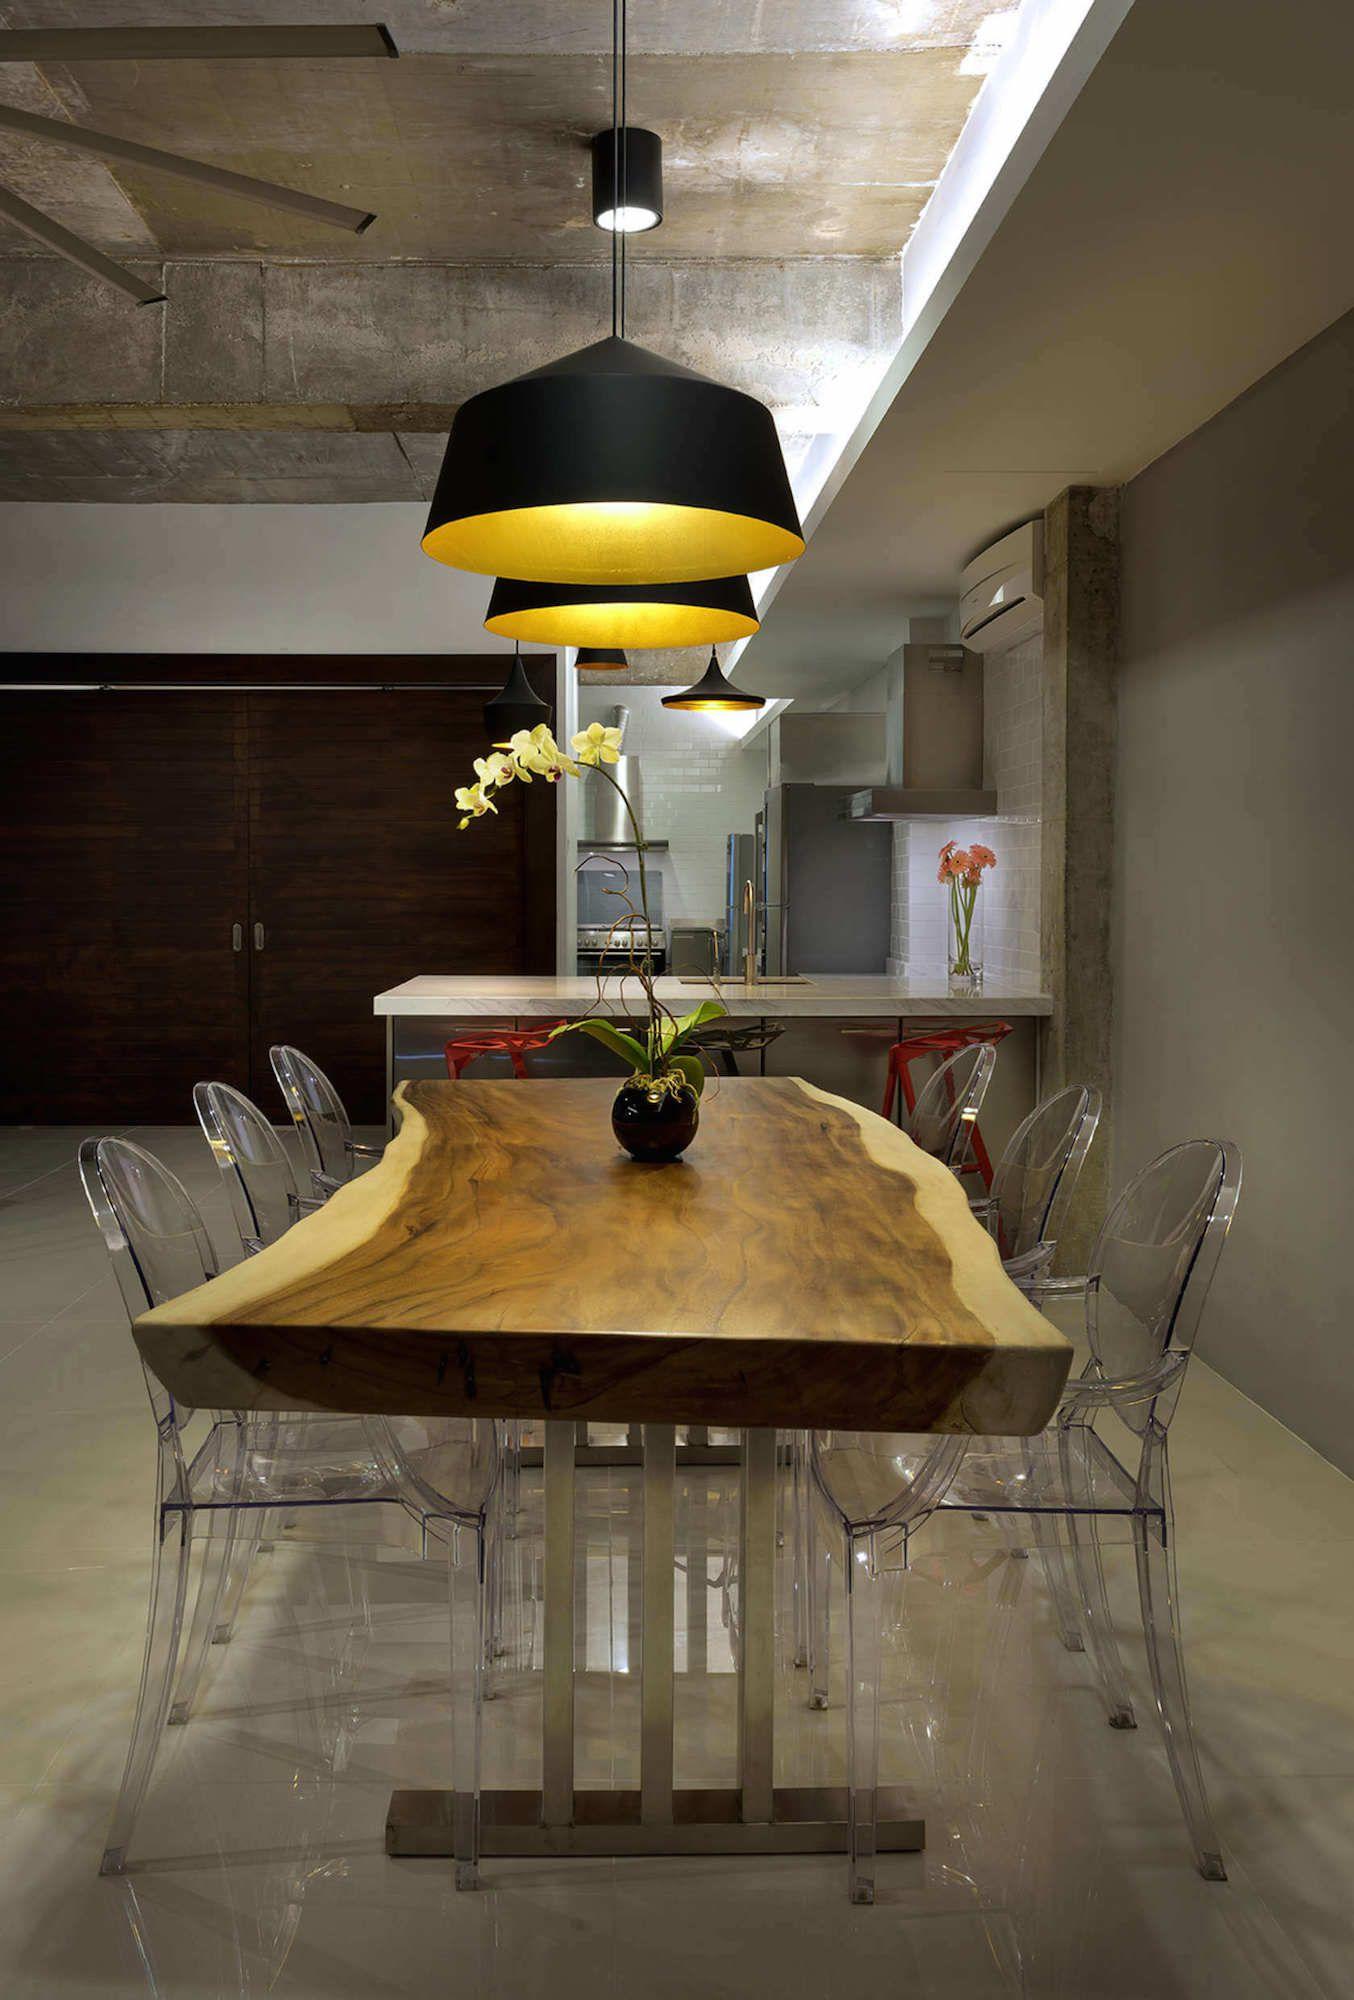 kuala-lumpur-home-drtan-lm-architect-05